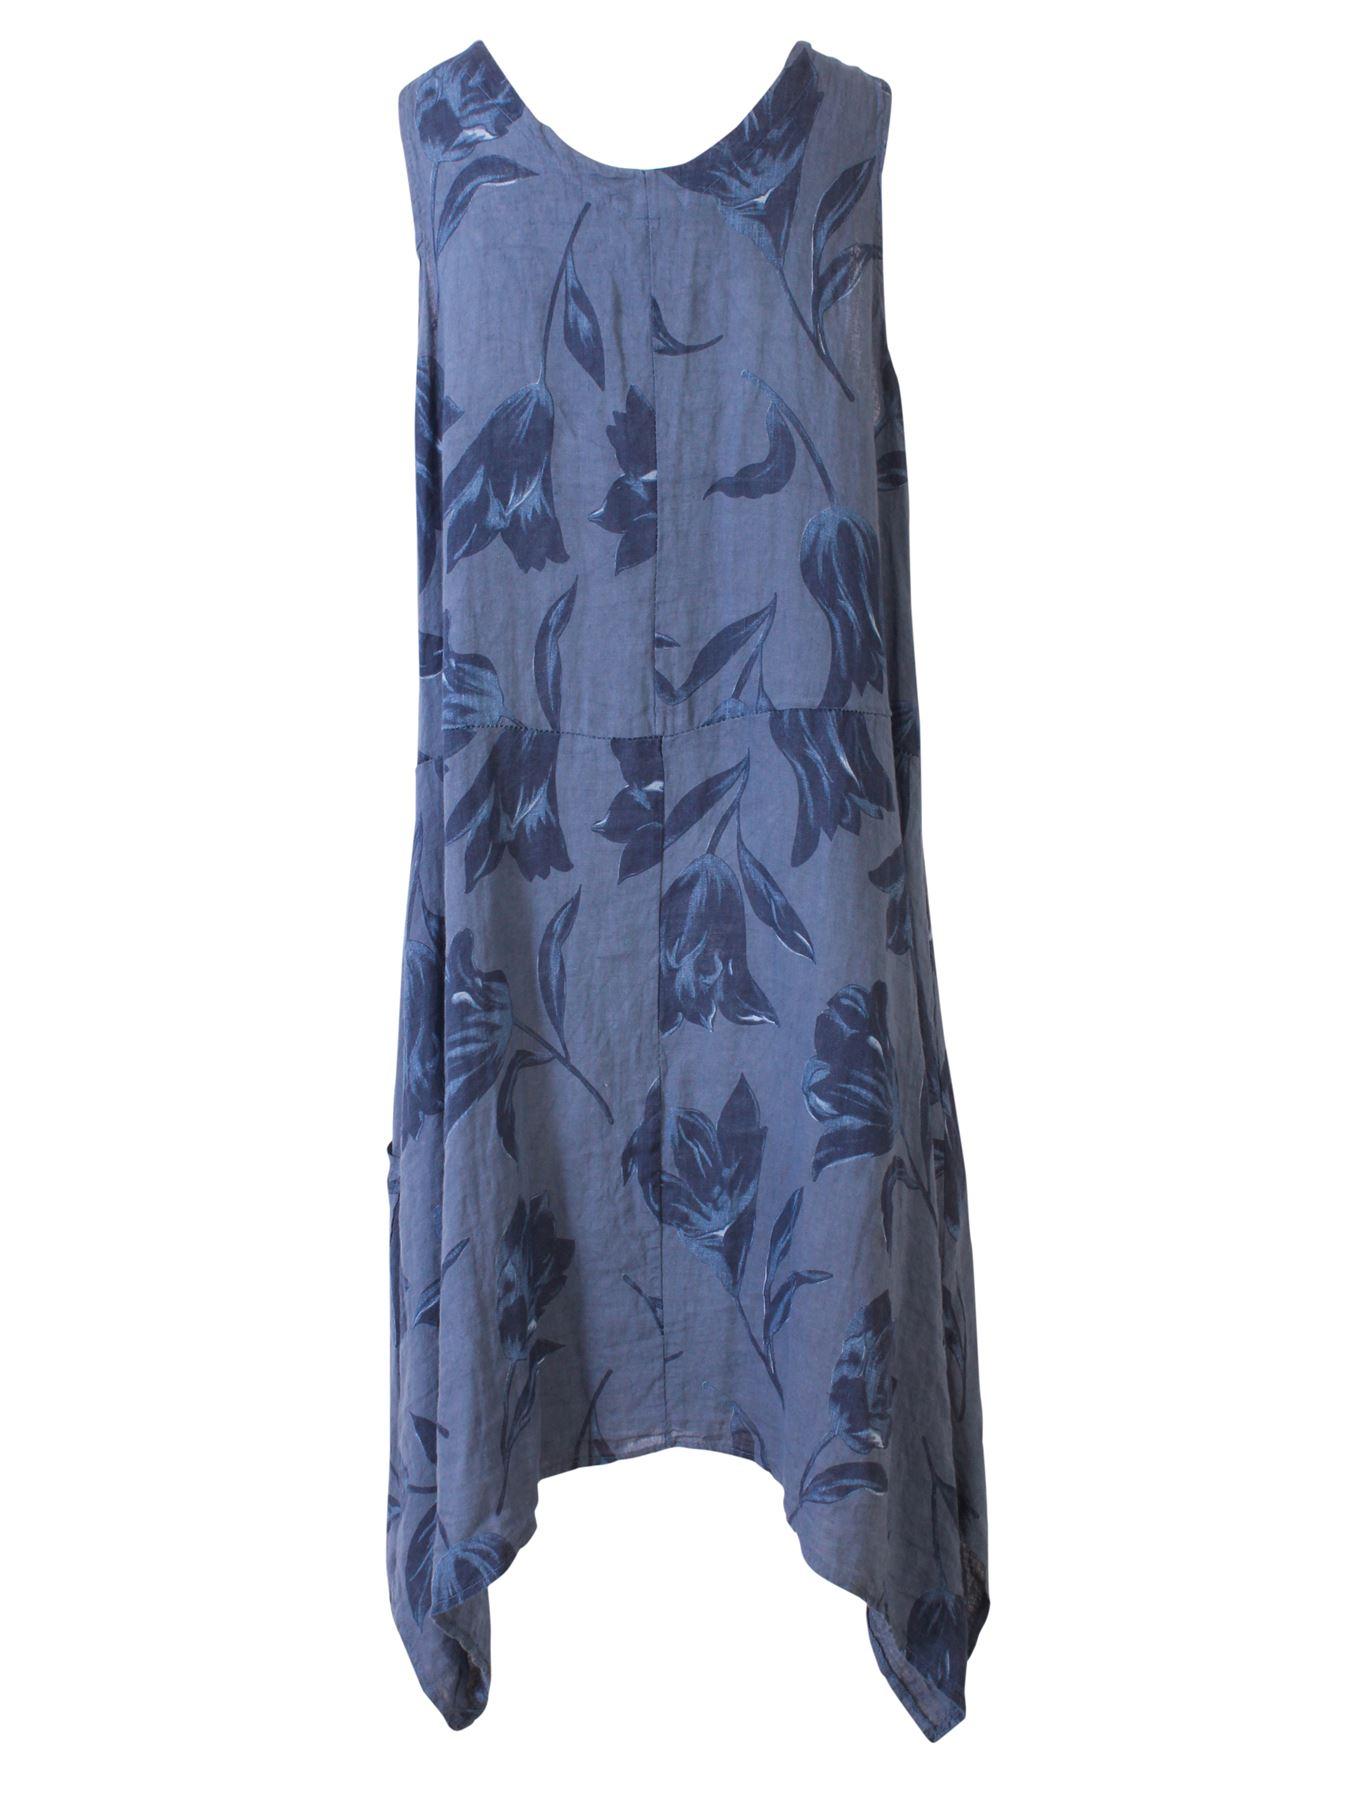 Womens-Tulip-Floral-Print-Italian-Lagenlook-Ladies-Linen-Dress-Two-Button-V-Neck thumbnail 7